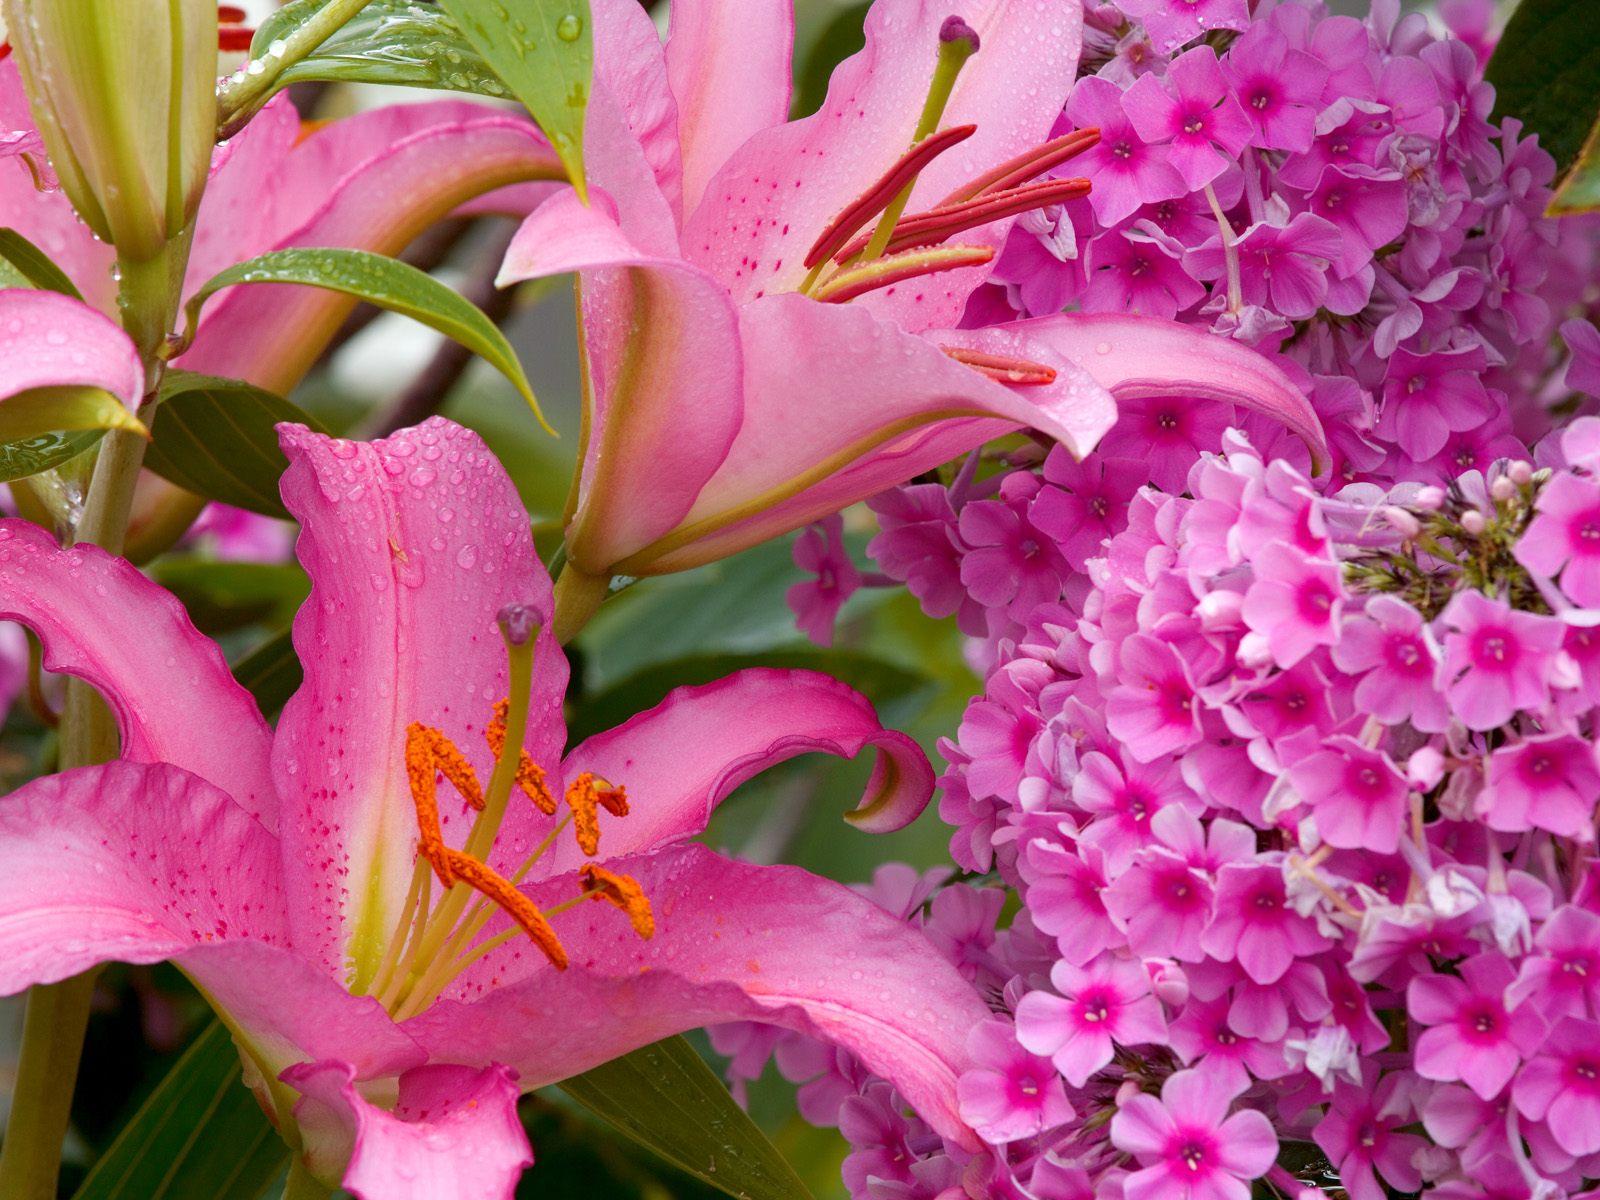 Basik ru обои на рабочий стол цветы на